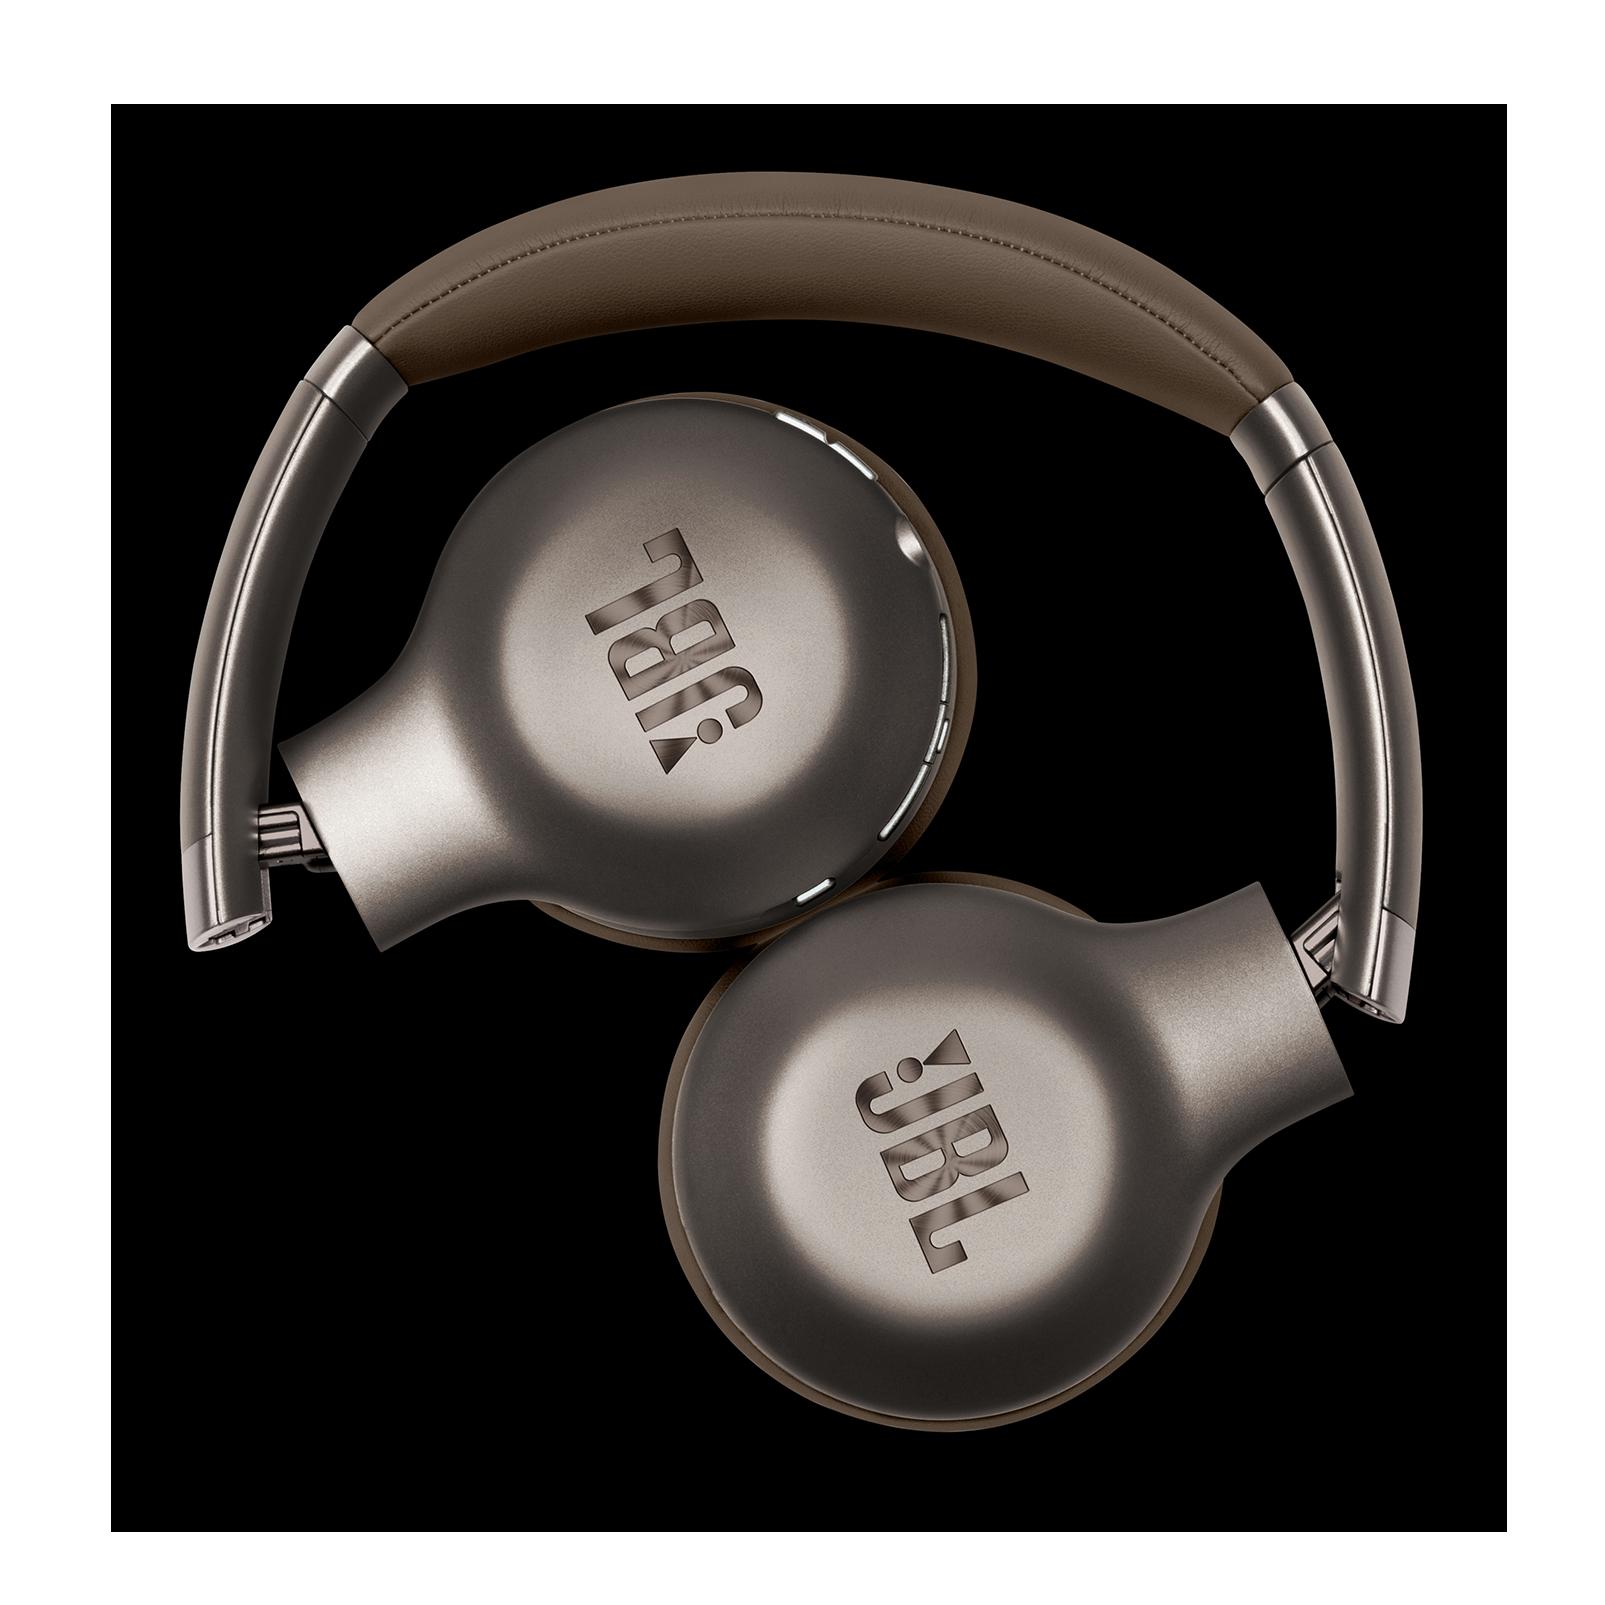 3ab2b441364 JBL EVEREST™ 310 | Wireless On-ear headphones